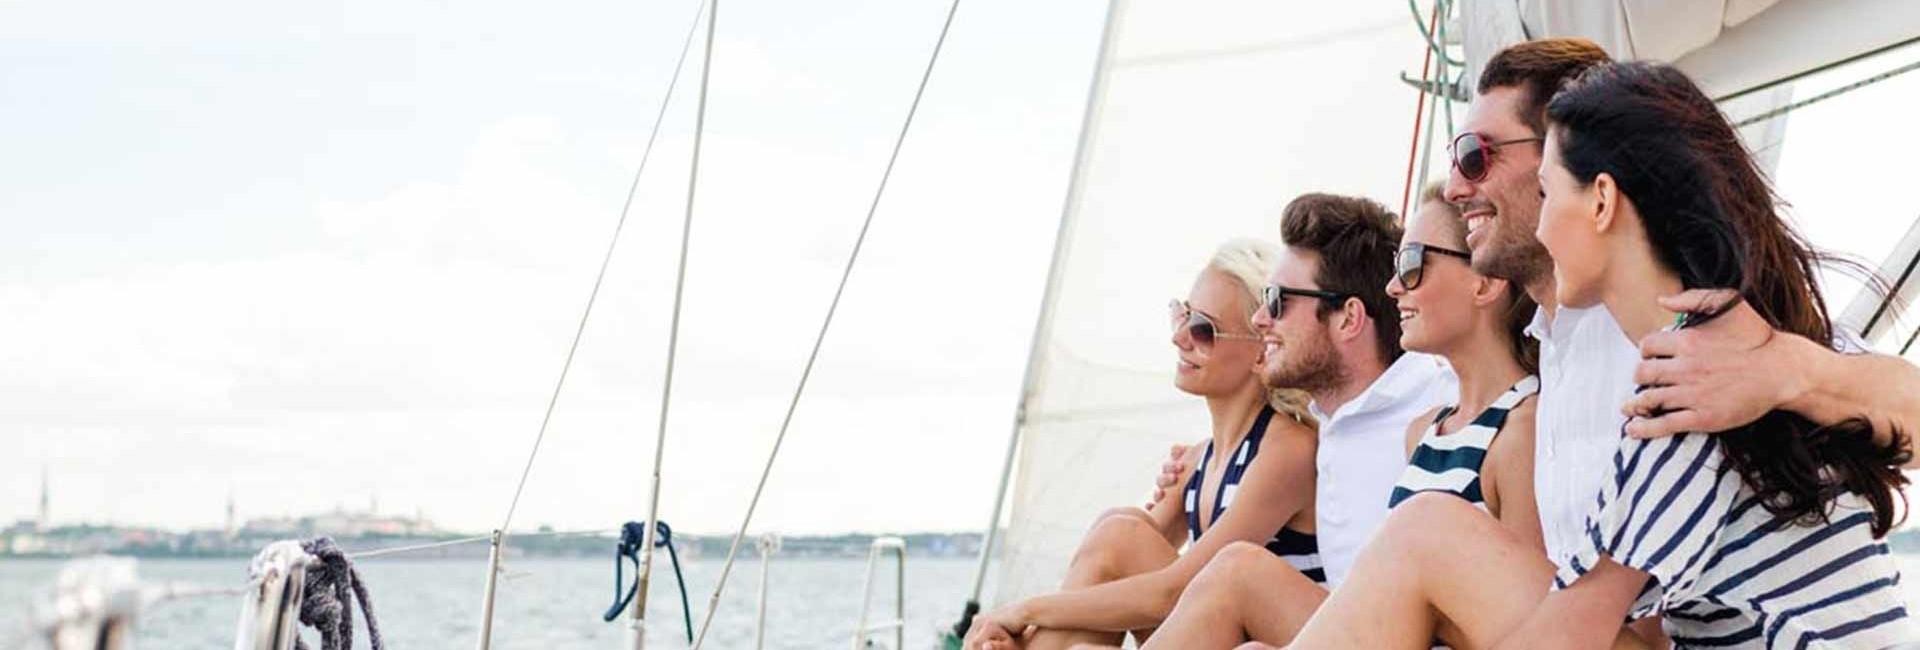 Friends having fun a on a sailboat